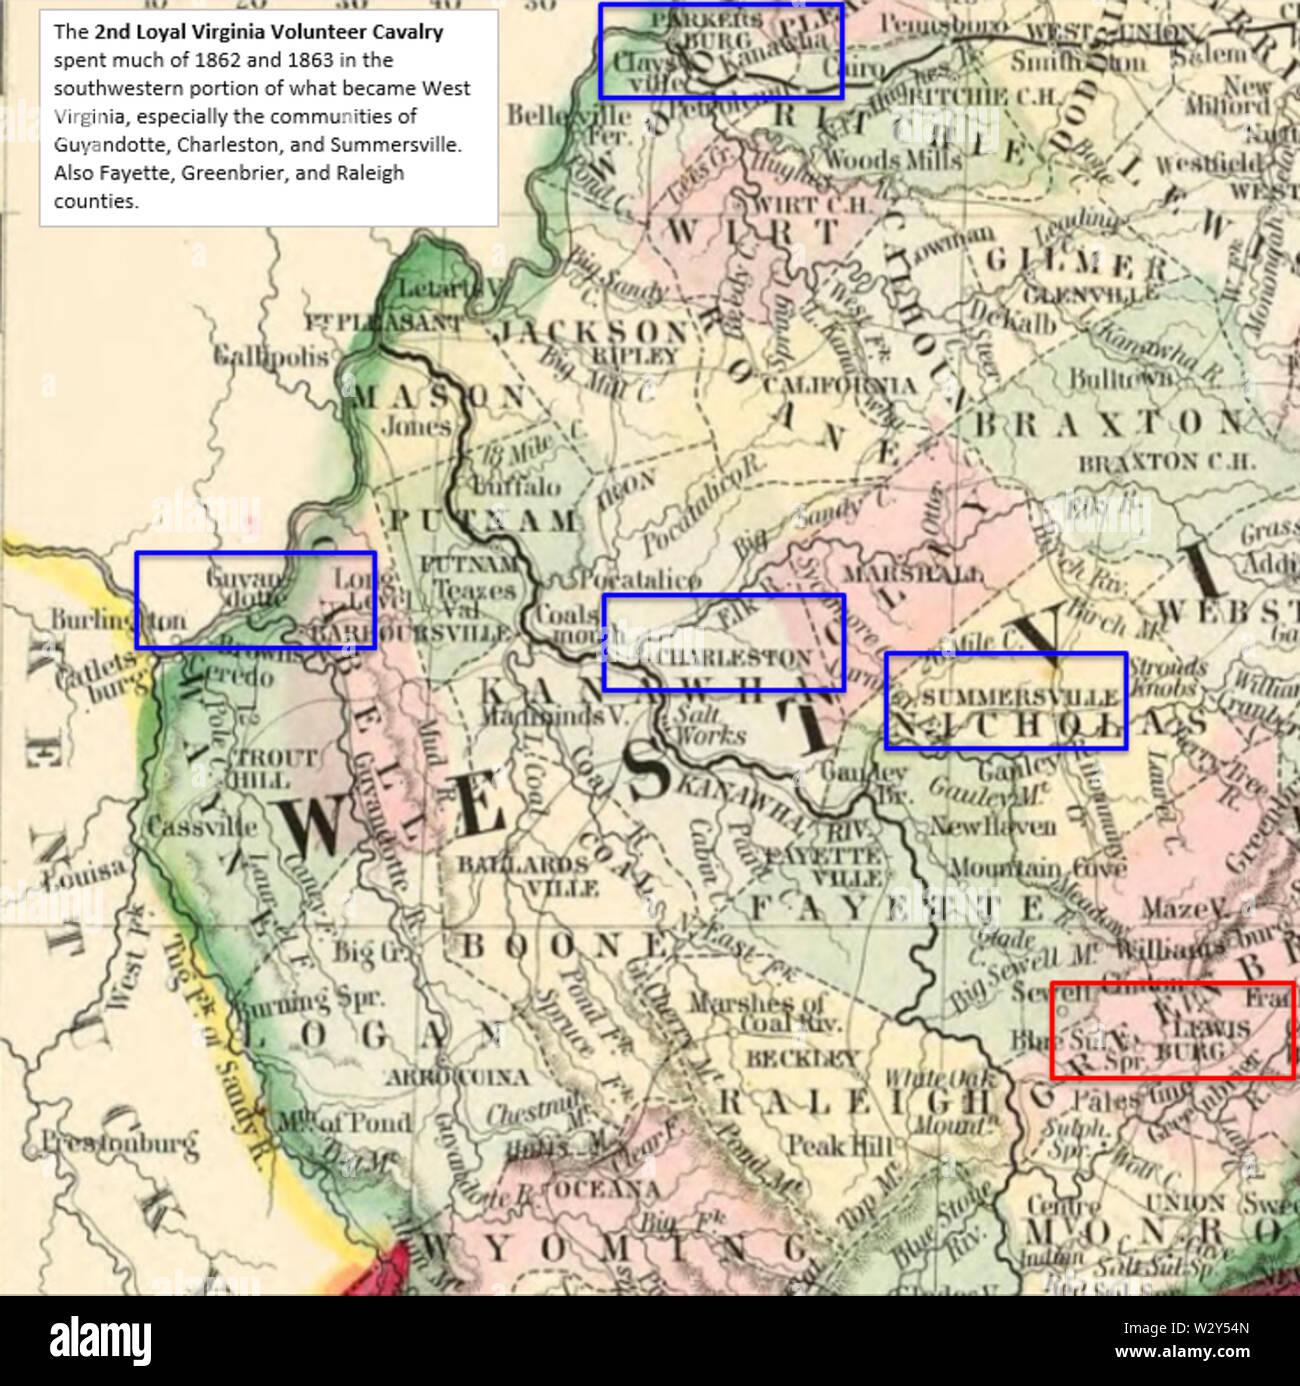 Kanawha Valley Stock Photos & Kanawha Valley Stock Images - Alamy on shenandoah county map, university of north carolina at chapel hill map, lincoln county map, roosevelt county map, doddridge county wv map, sumner county map, letcher county map, charleston wv county map, roane county map, upshur county wv map, west va county map, grave creek mound map, delaware county map, chariton county map, kanwha county map, monongalia county map, nodaway county map, hodgeman county map, boyd county map, greeley county map,